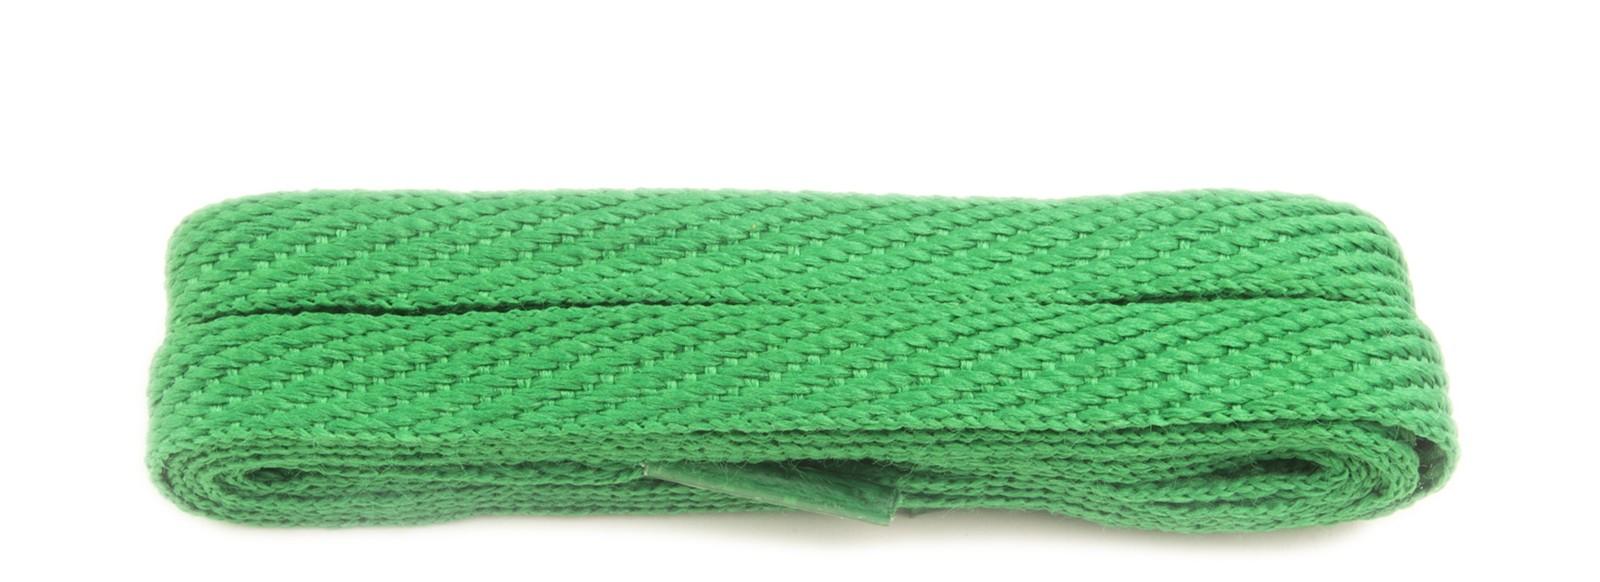 Green 120cm American Flat 10mm Banded